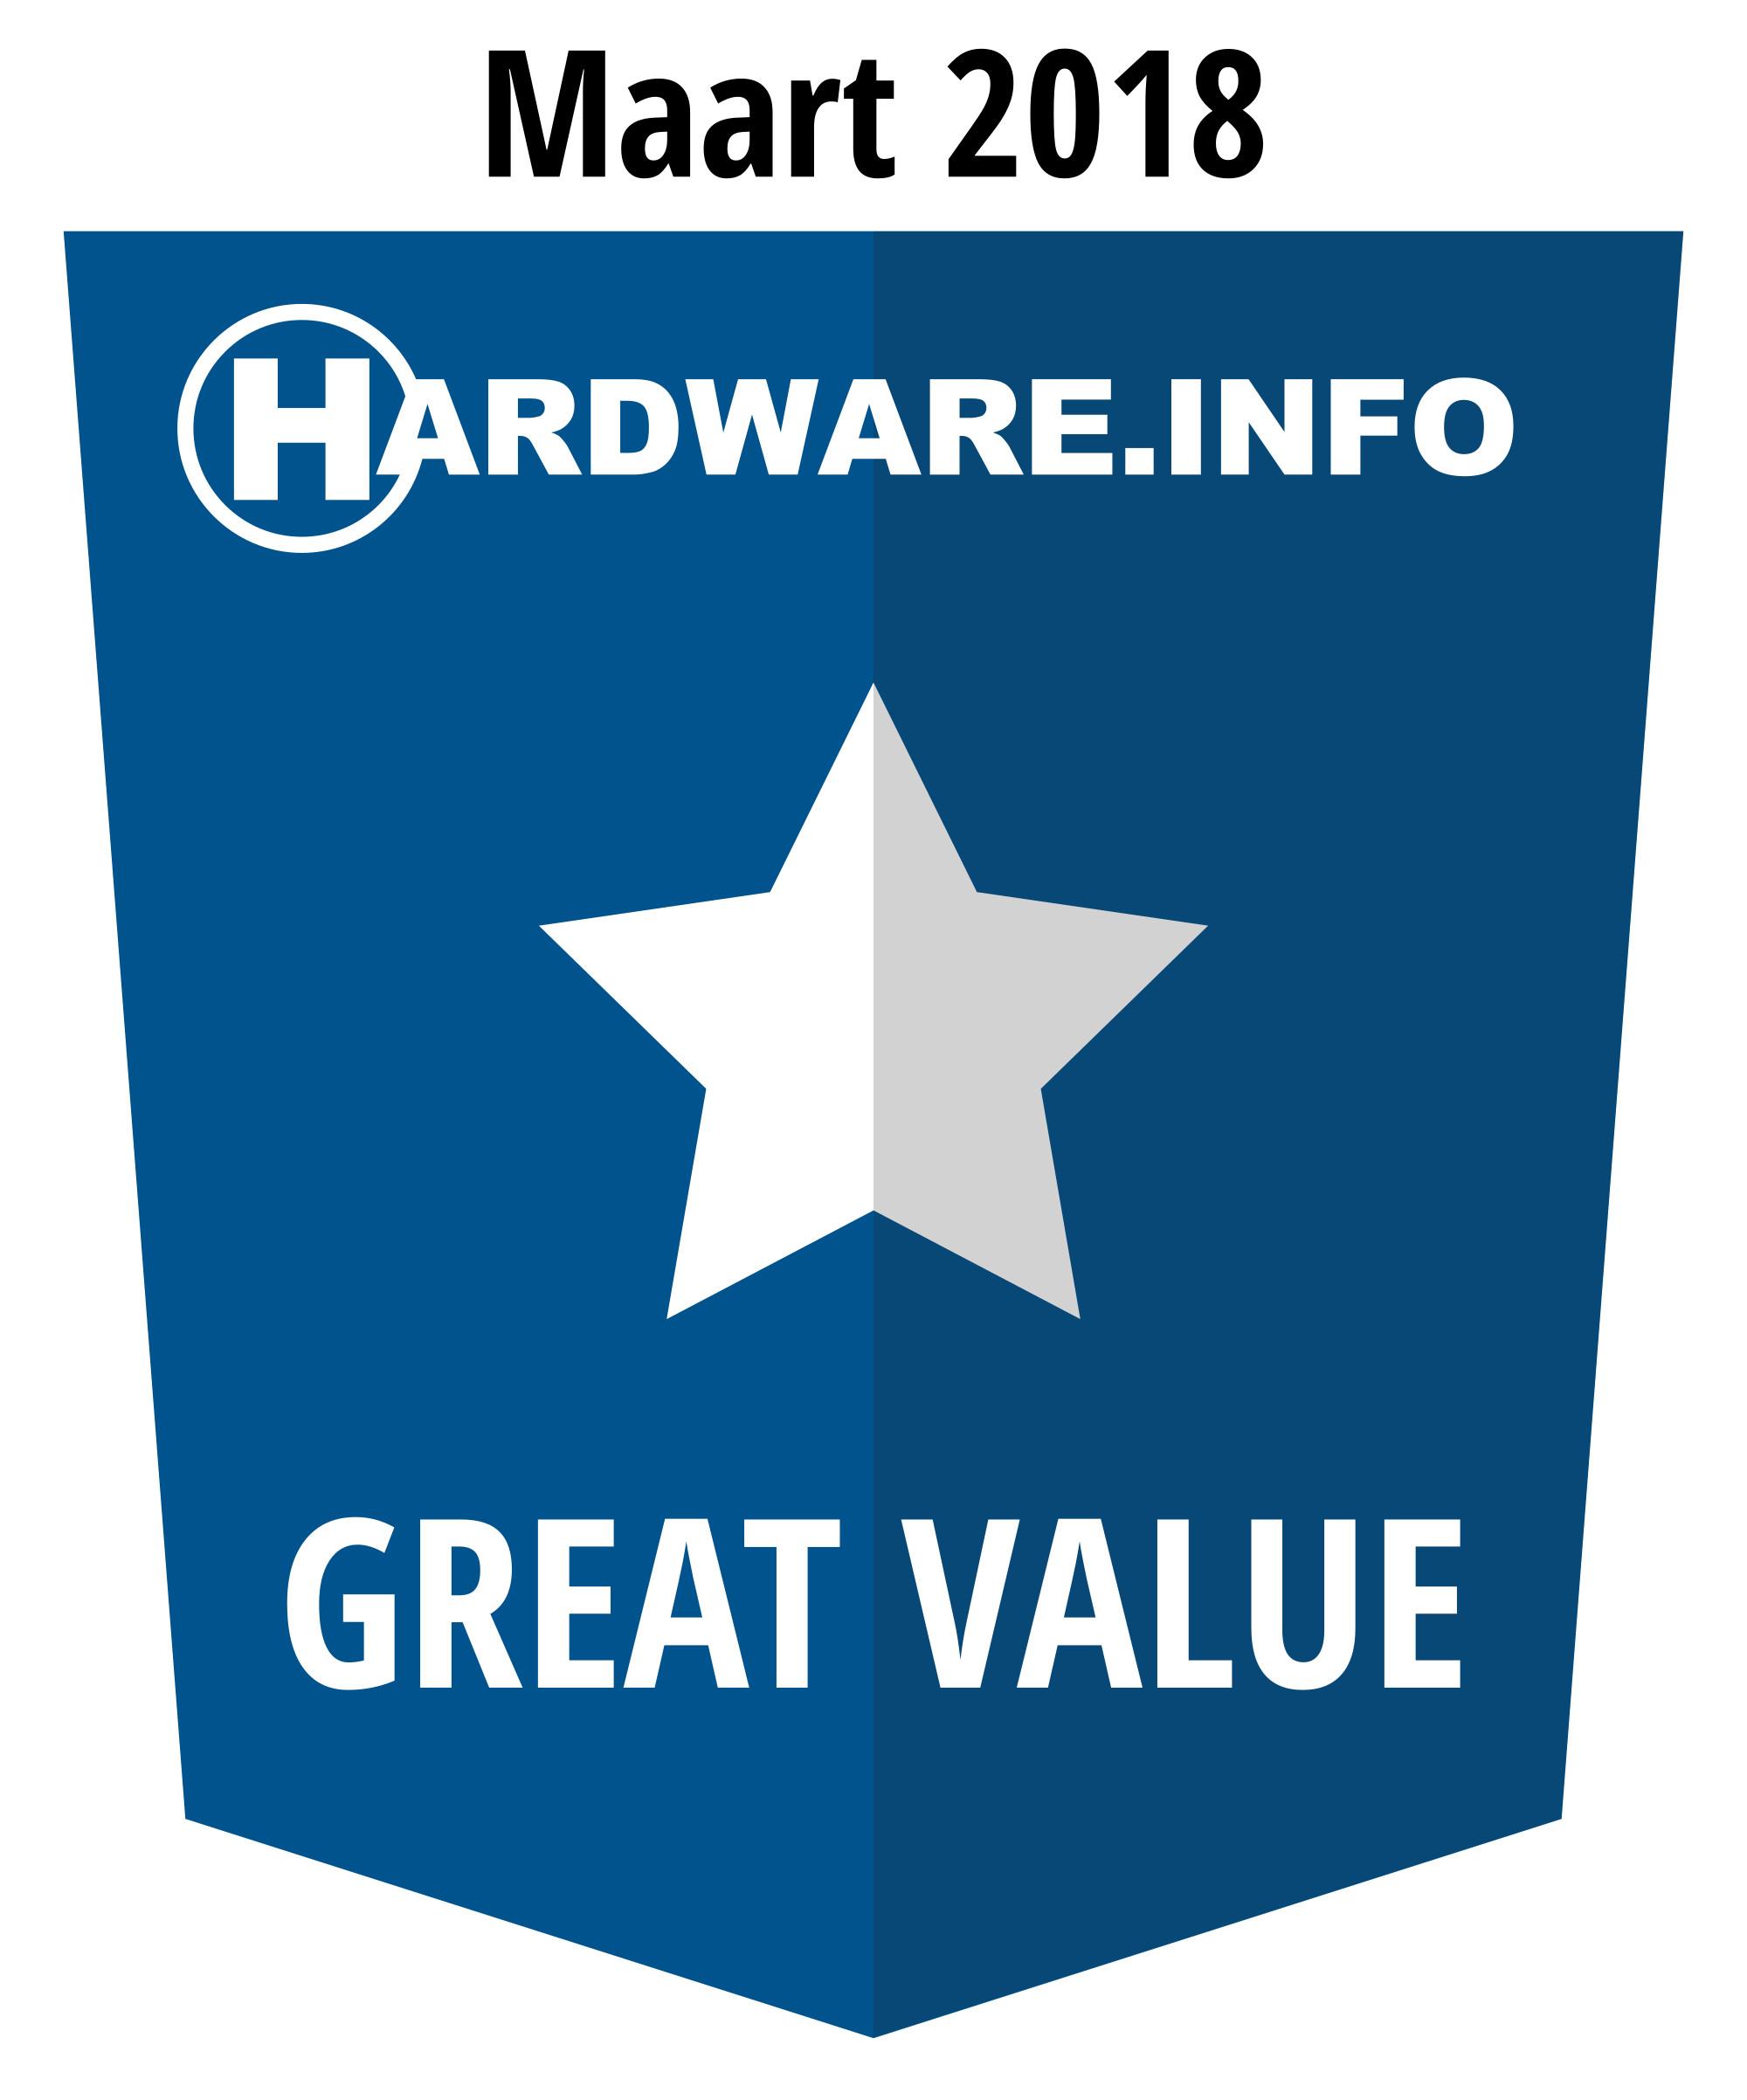 Hardware.info Value award 03-2018